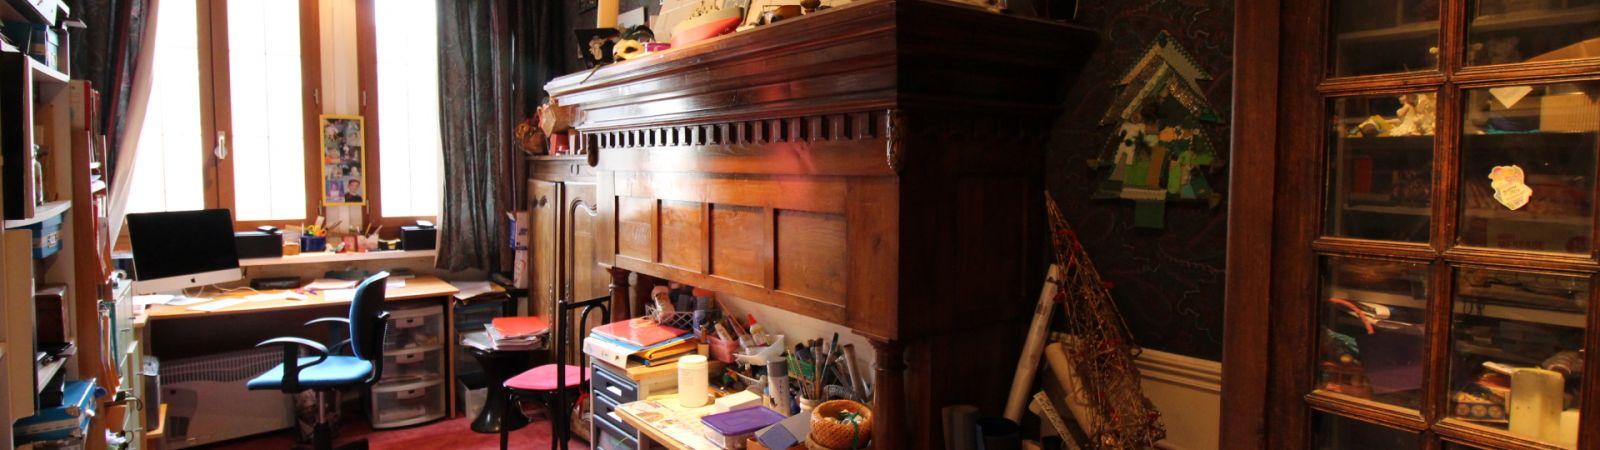 photo 5: Somptueuse demeure du XIXème siècle